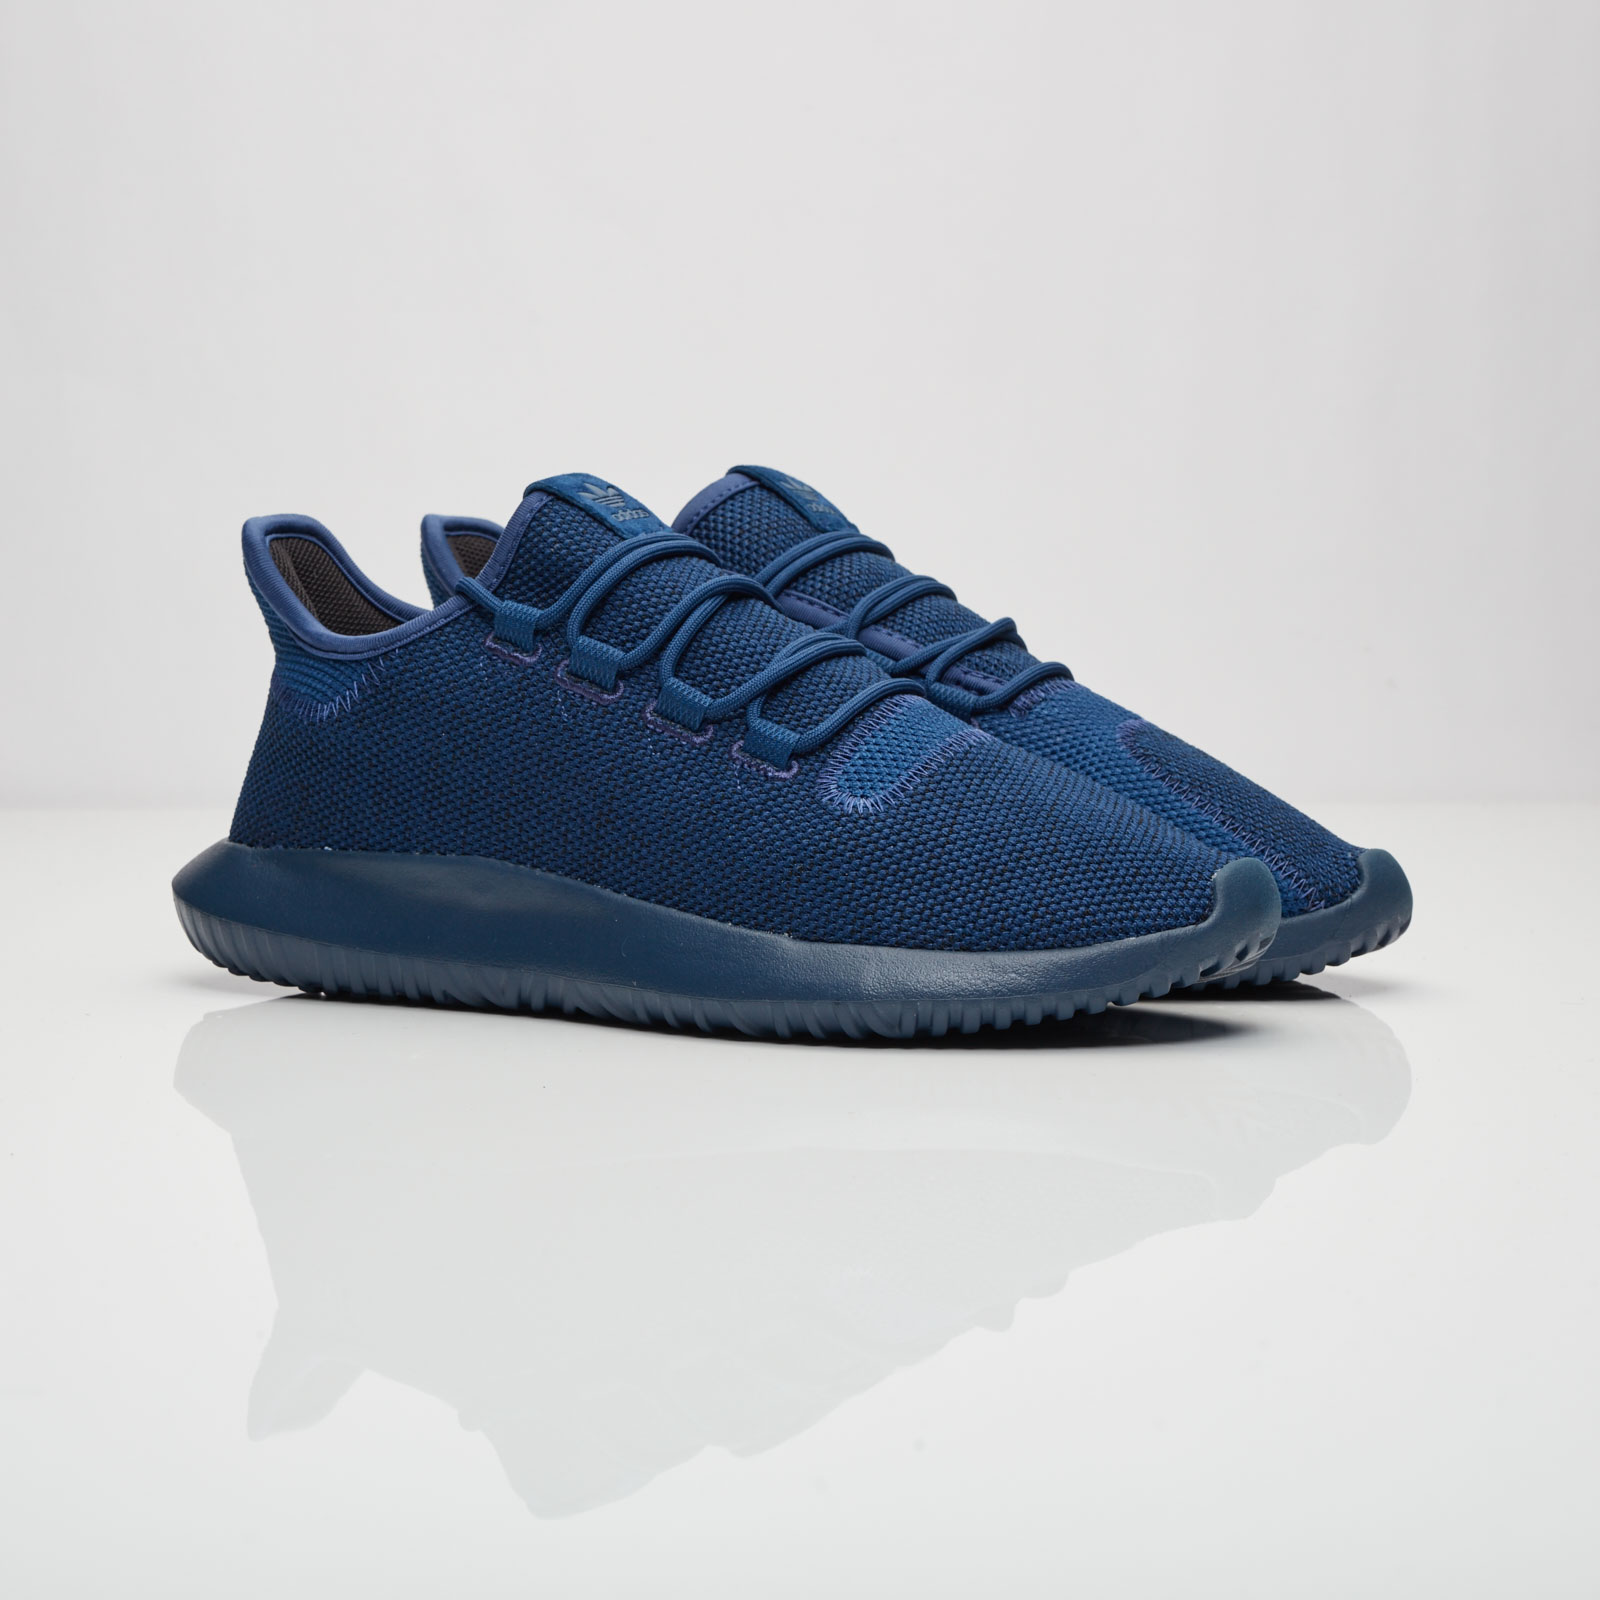 tubolari a bb8825 adidas sneakersnstuff scarpe adidas bb8825 ombra 77cec6